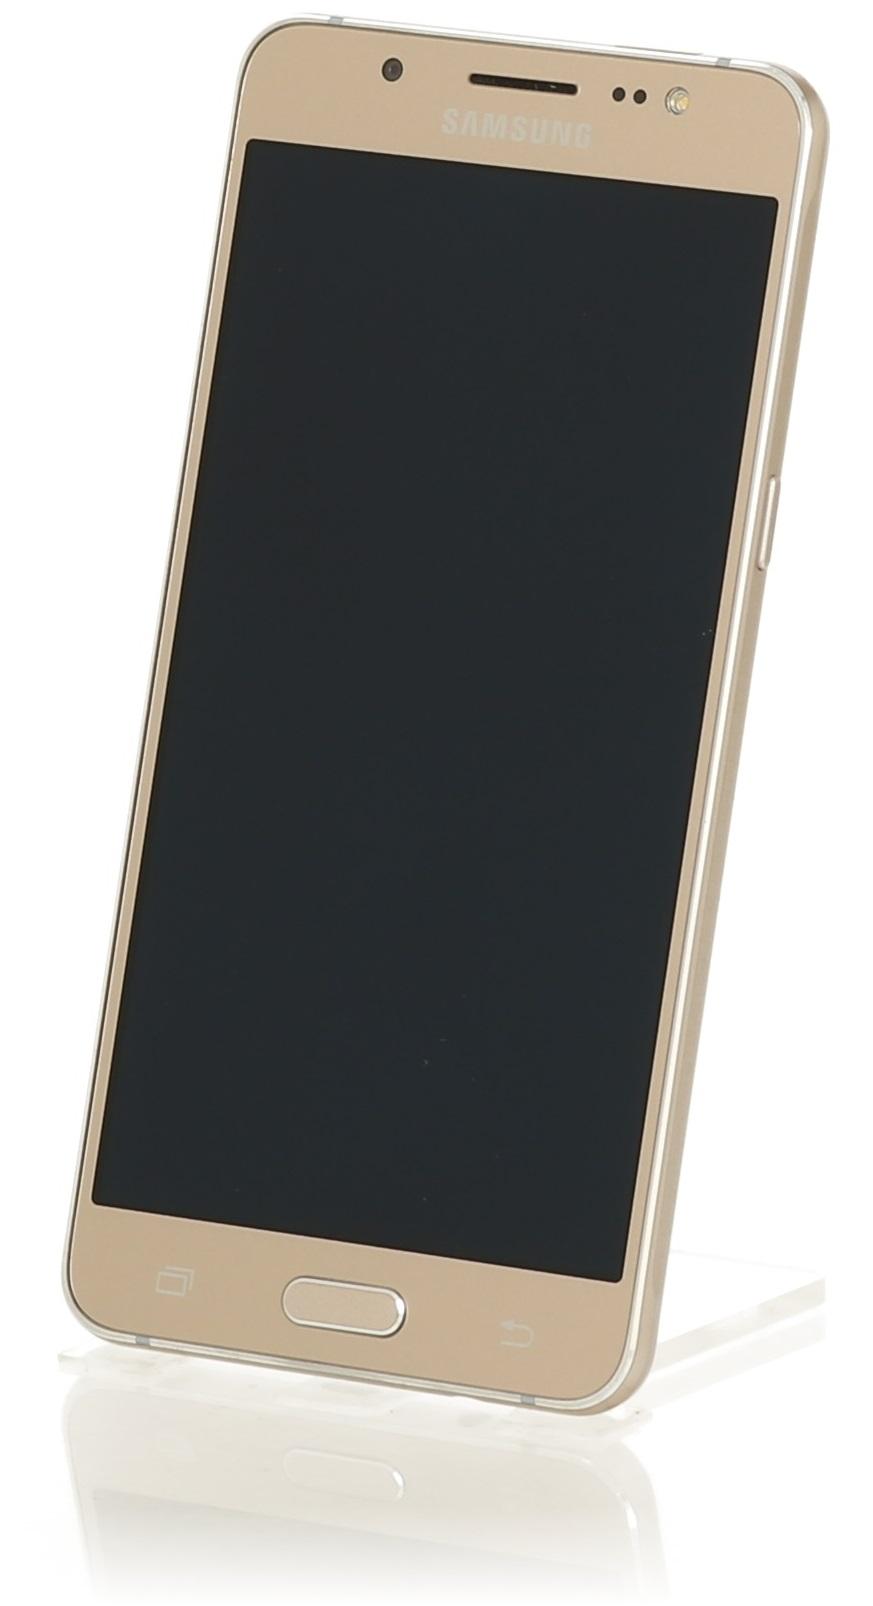 Samsung J510F Galaxy J5 (2016) DUOS 16GB gold